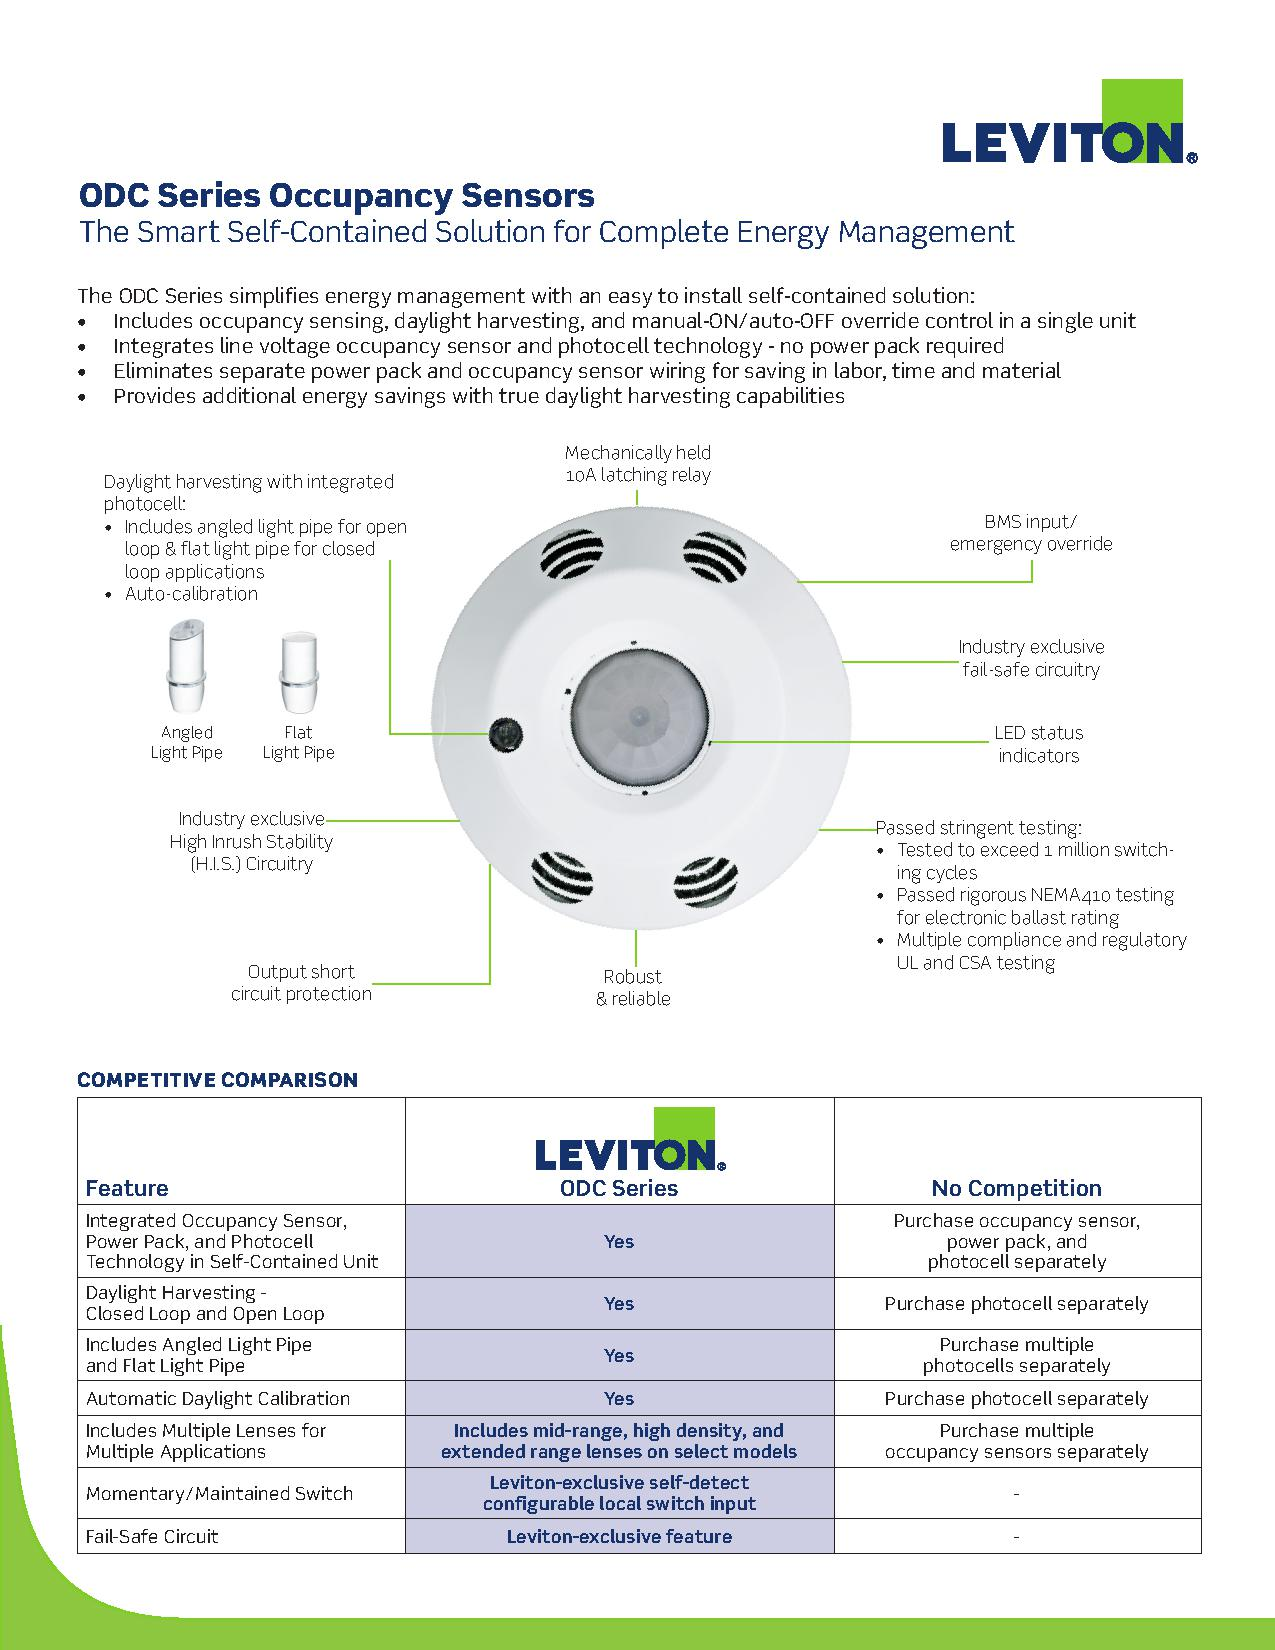 leviton odc line voltage integrated occupancy sensors ajb sales Occupancy Sensor Wiring Diagram